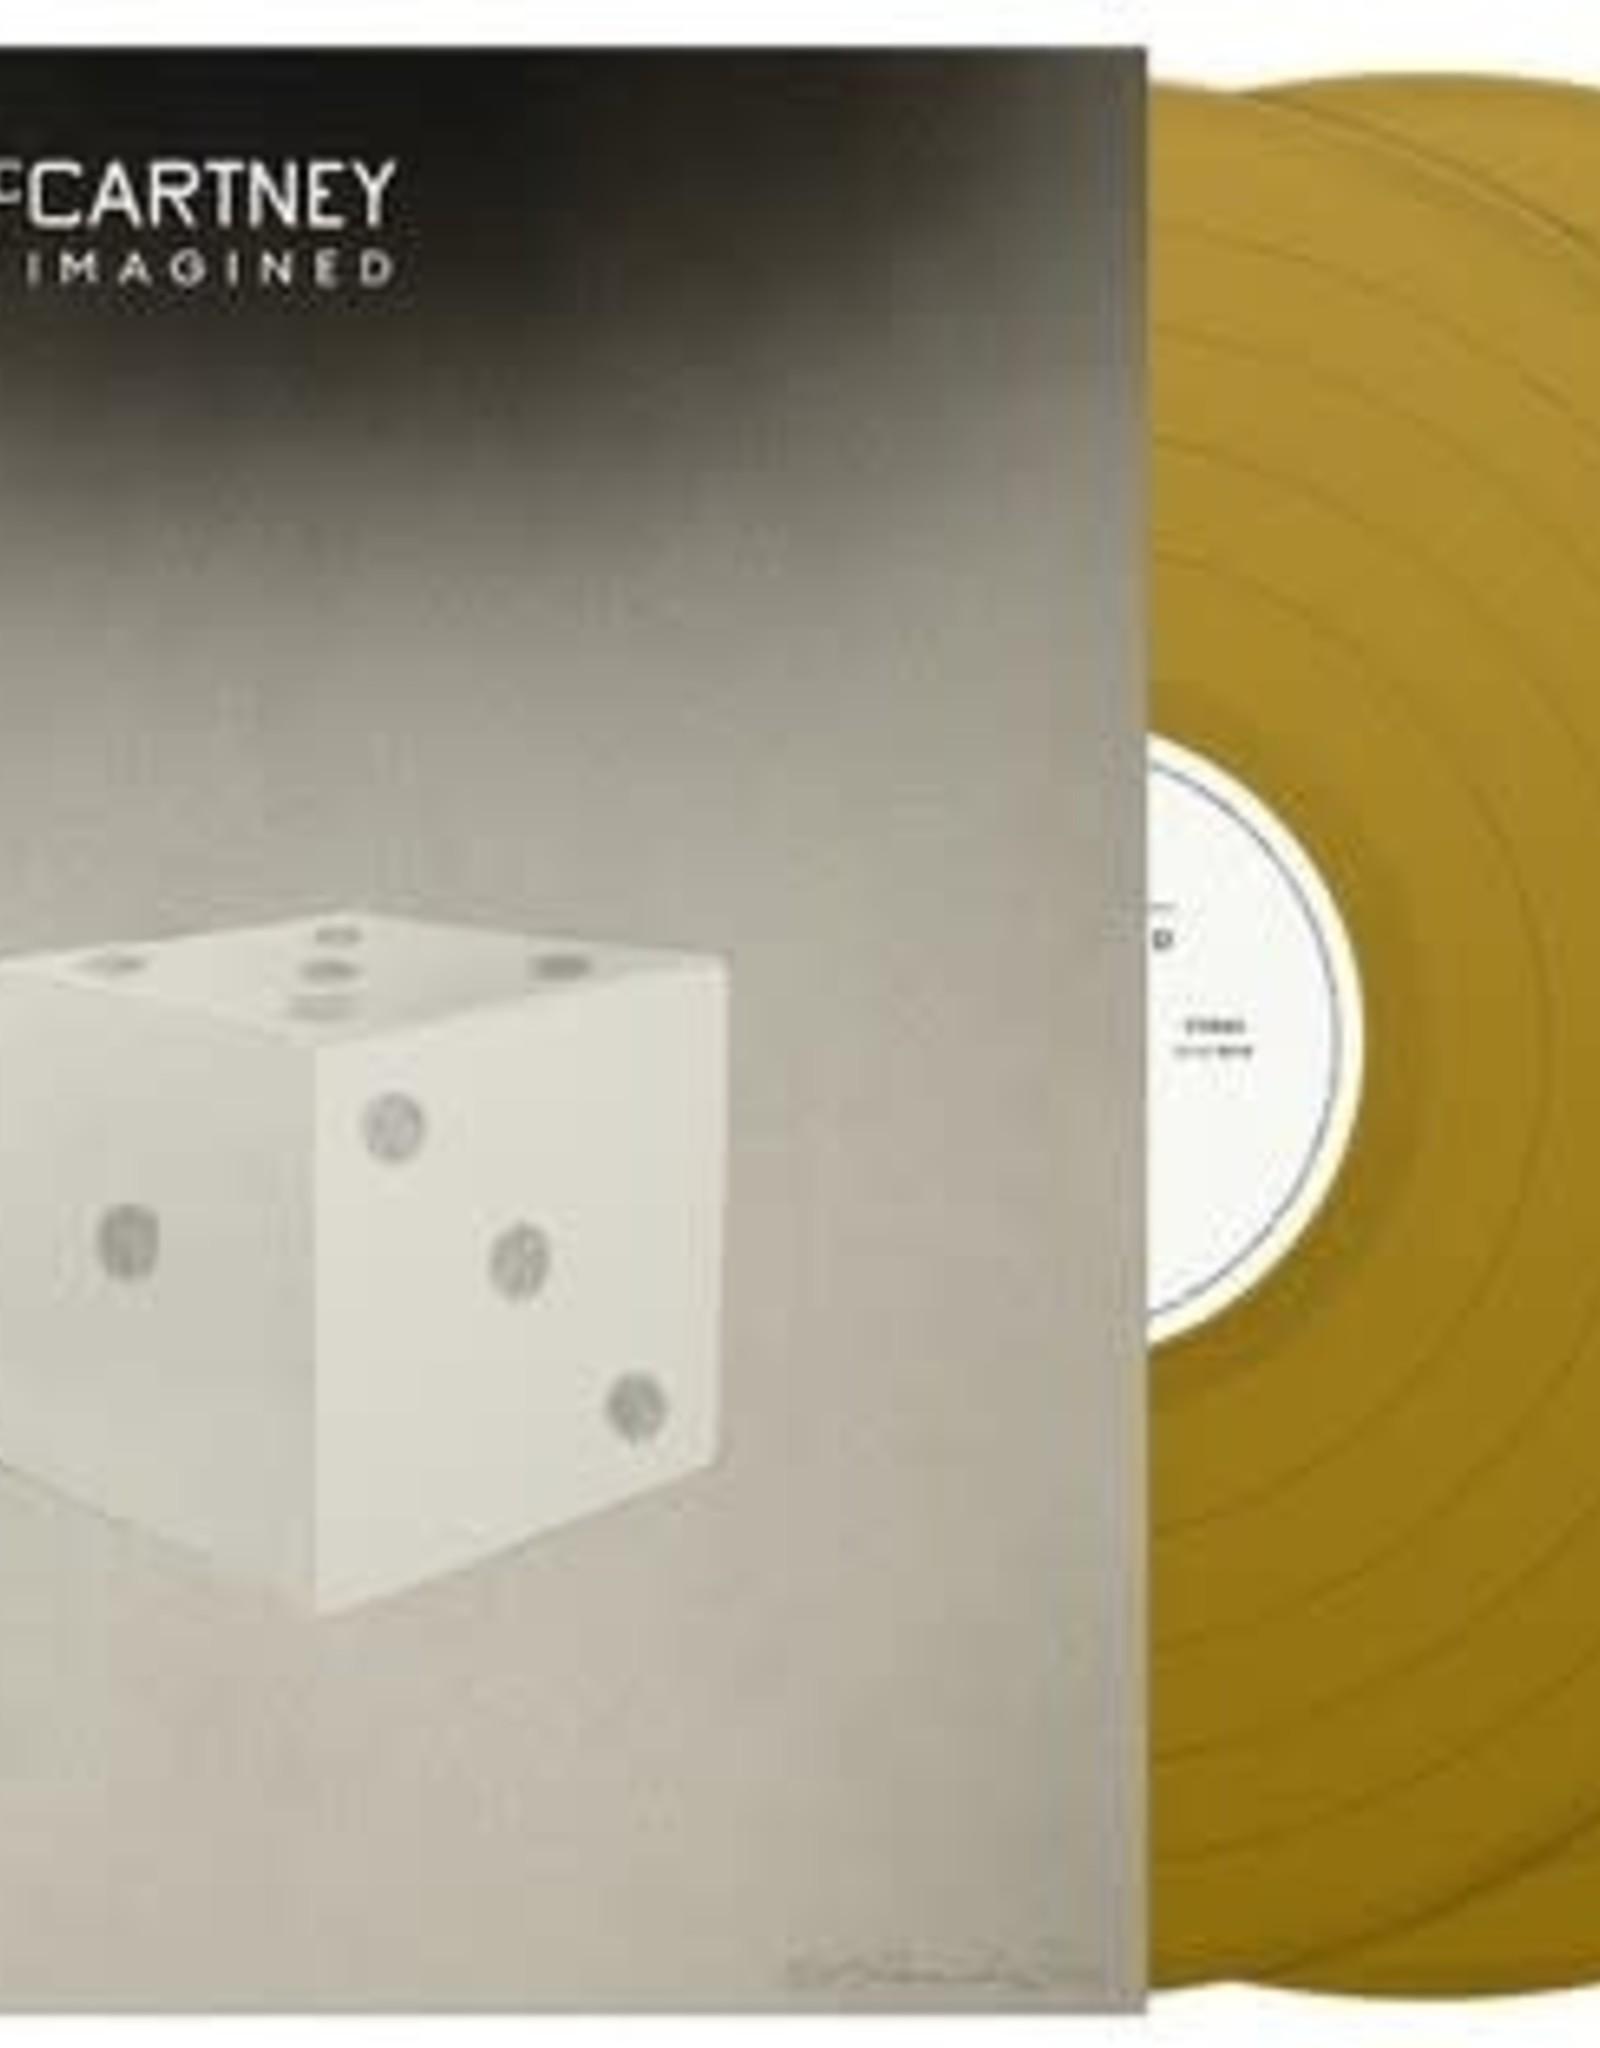 Paul McCartney - McCartney III Imagined [Gold 2 LP]